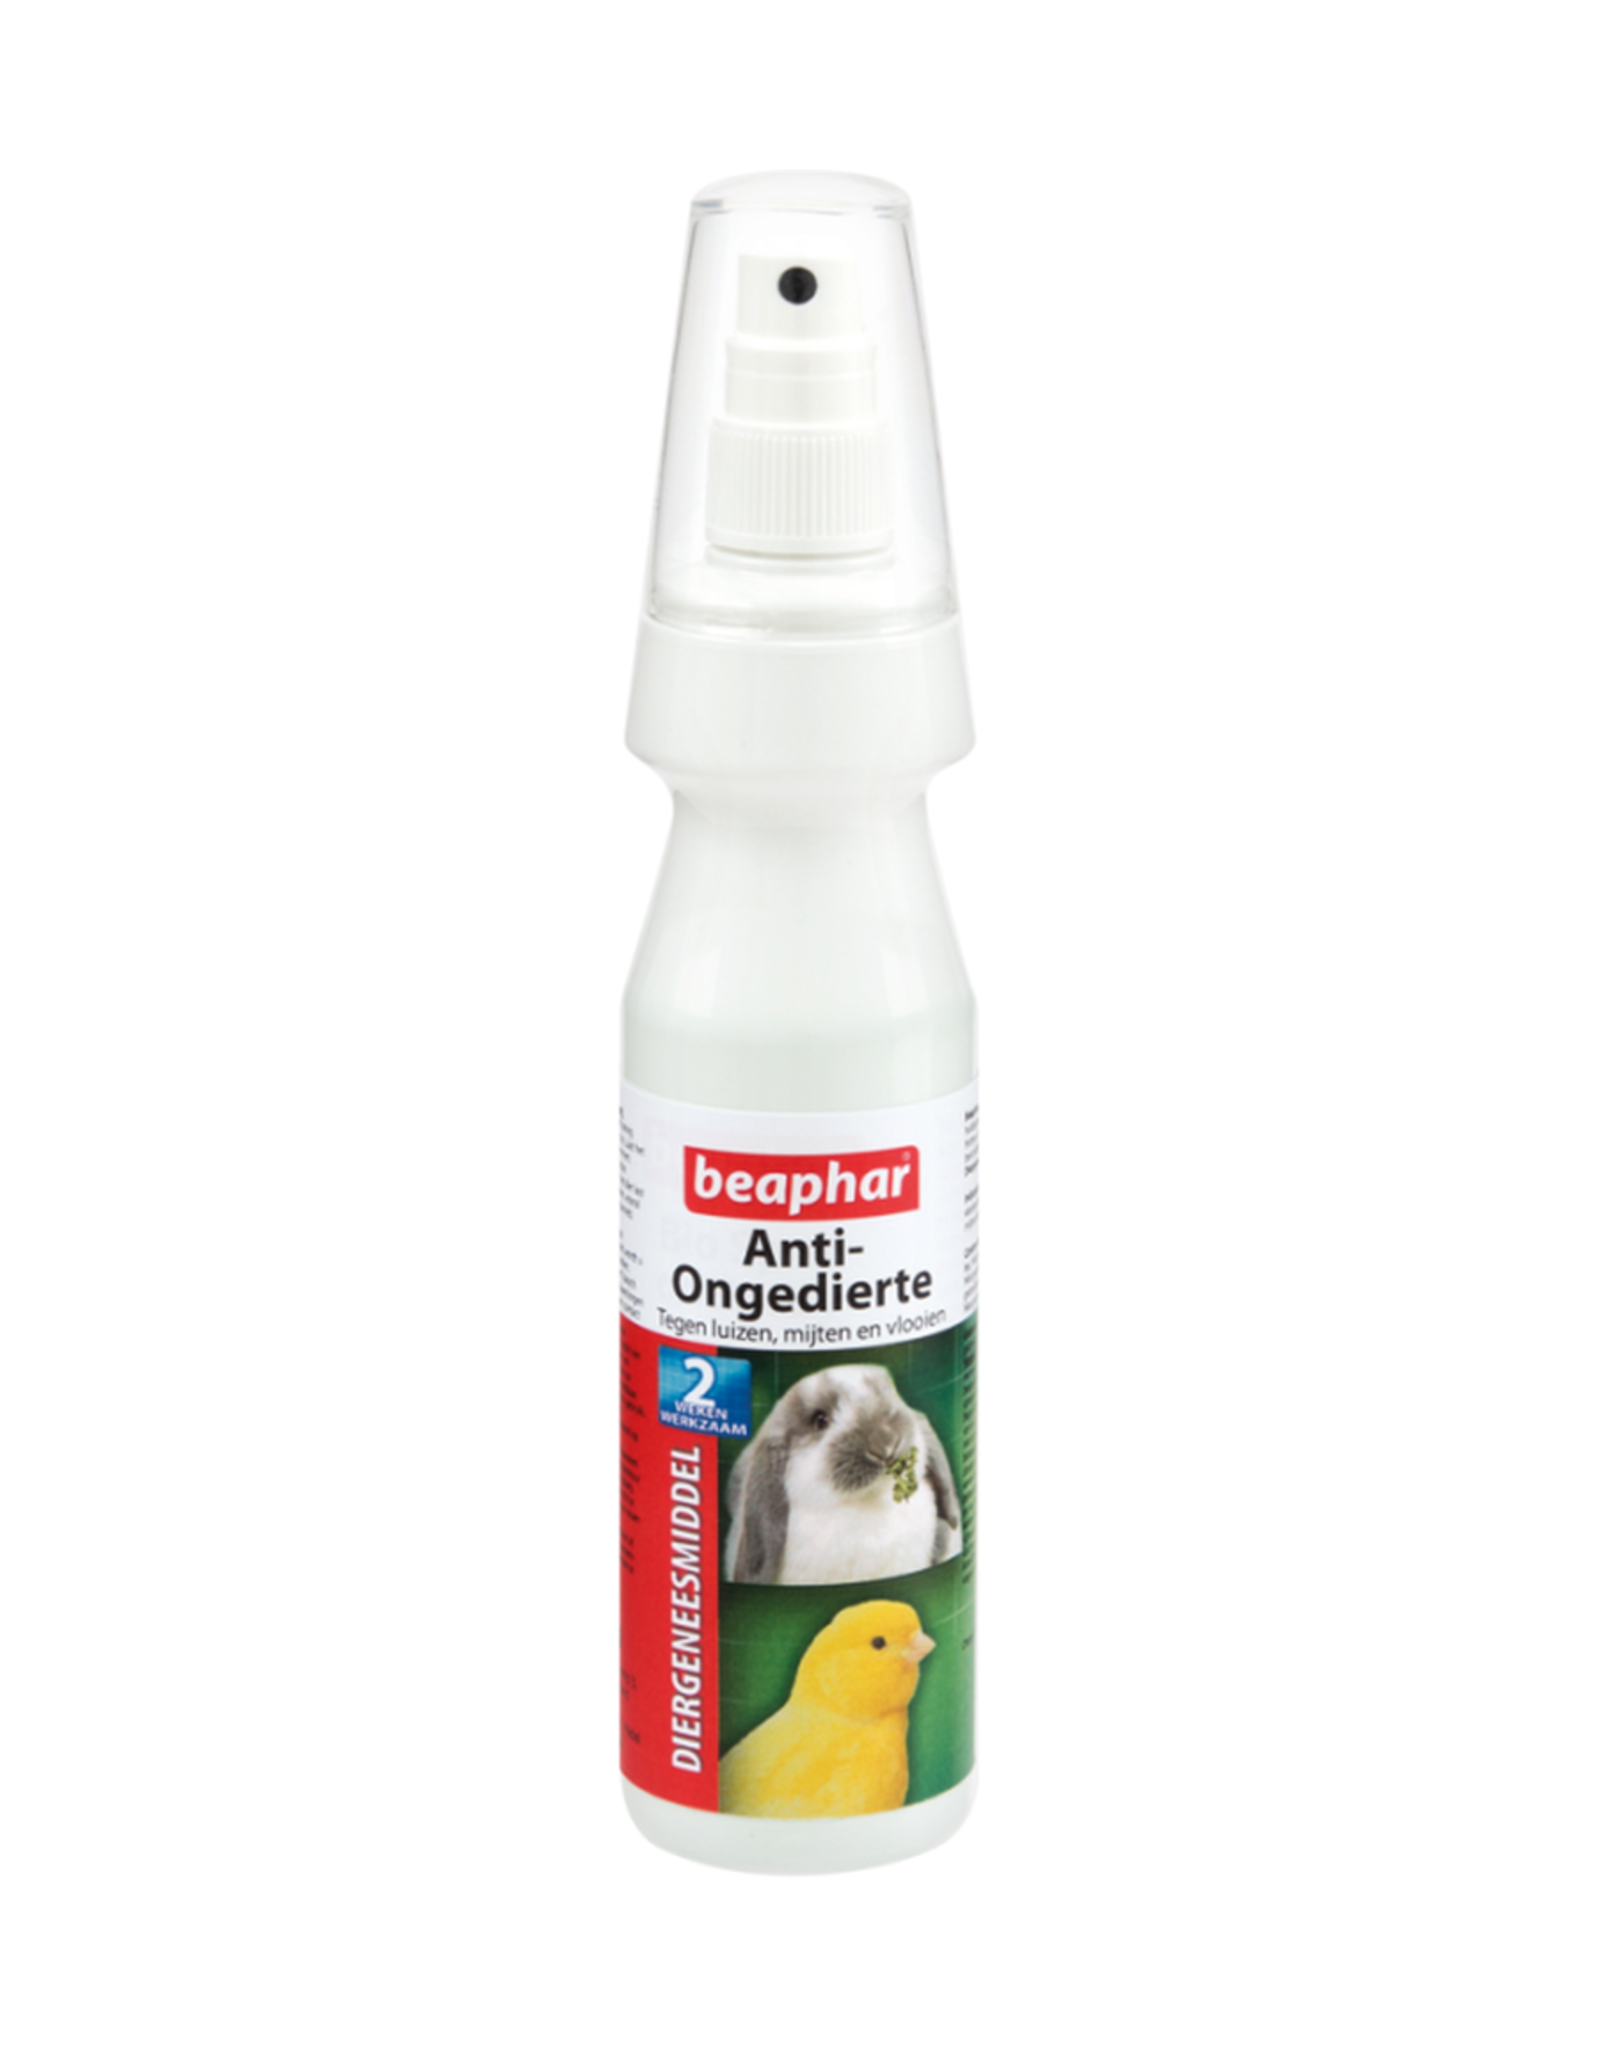 Beaphar Anti-Ongediertespray 150Ml